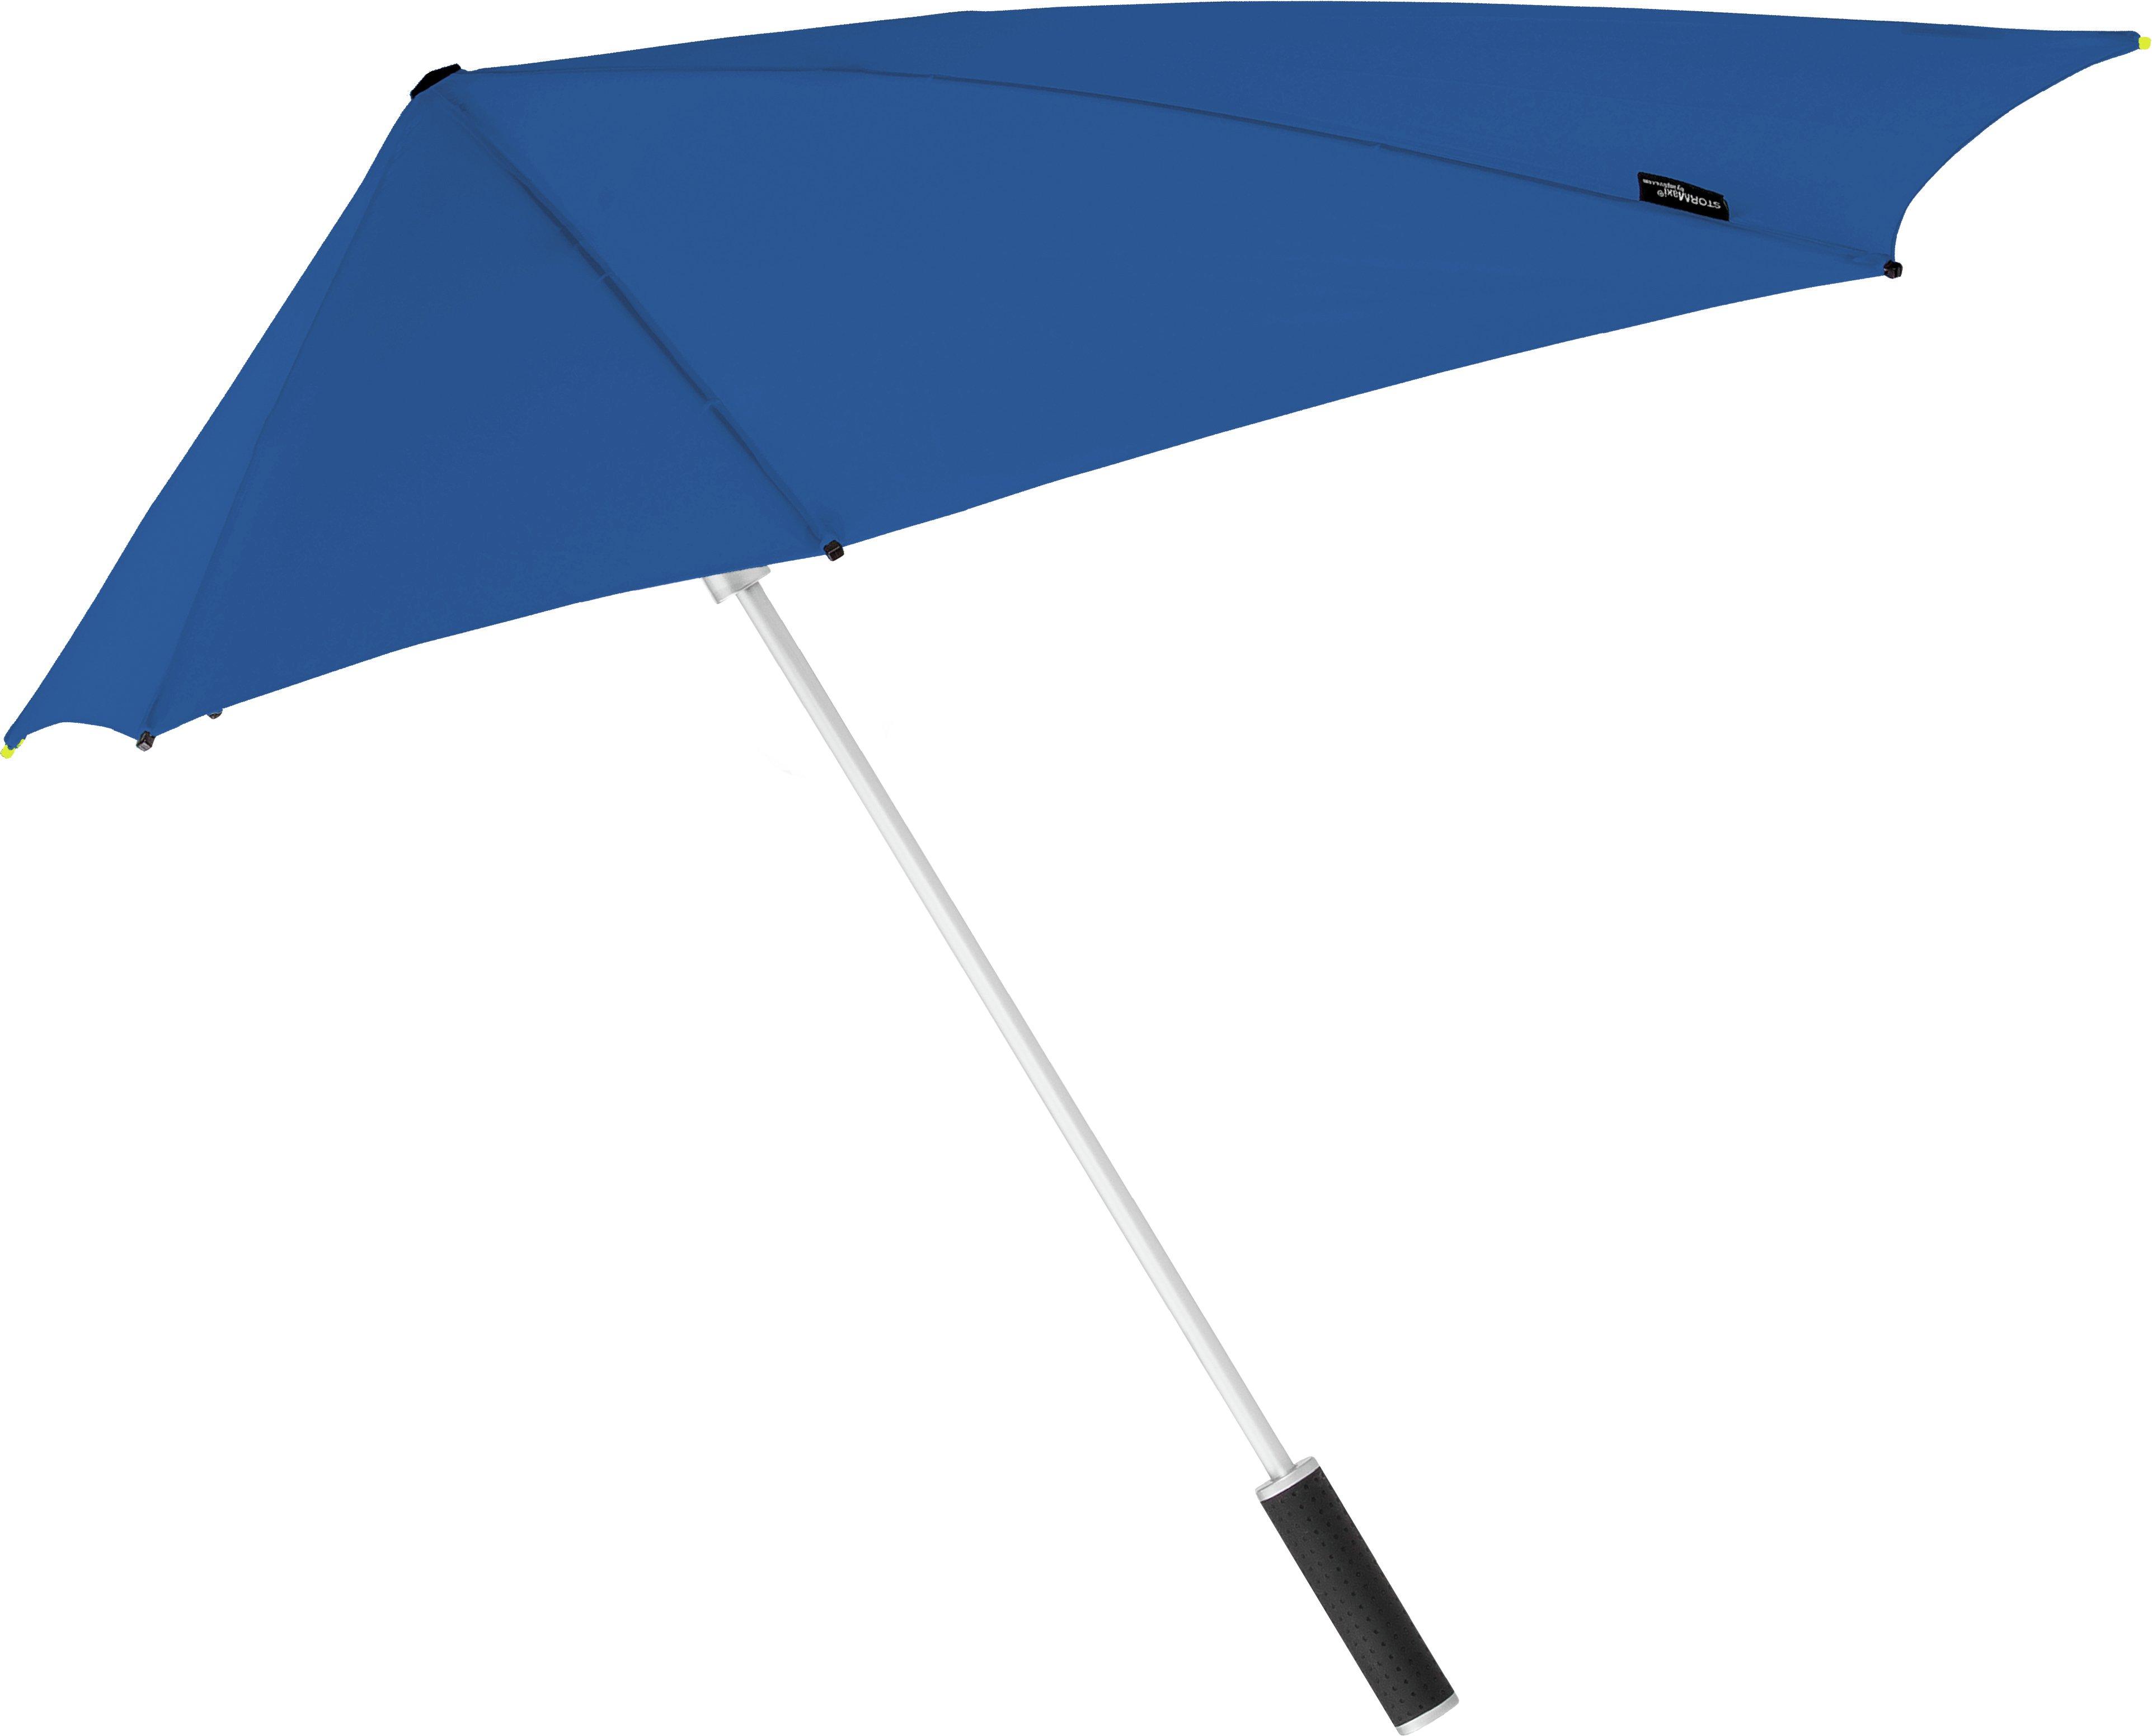 Stealthbomber Umbrella review